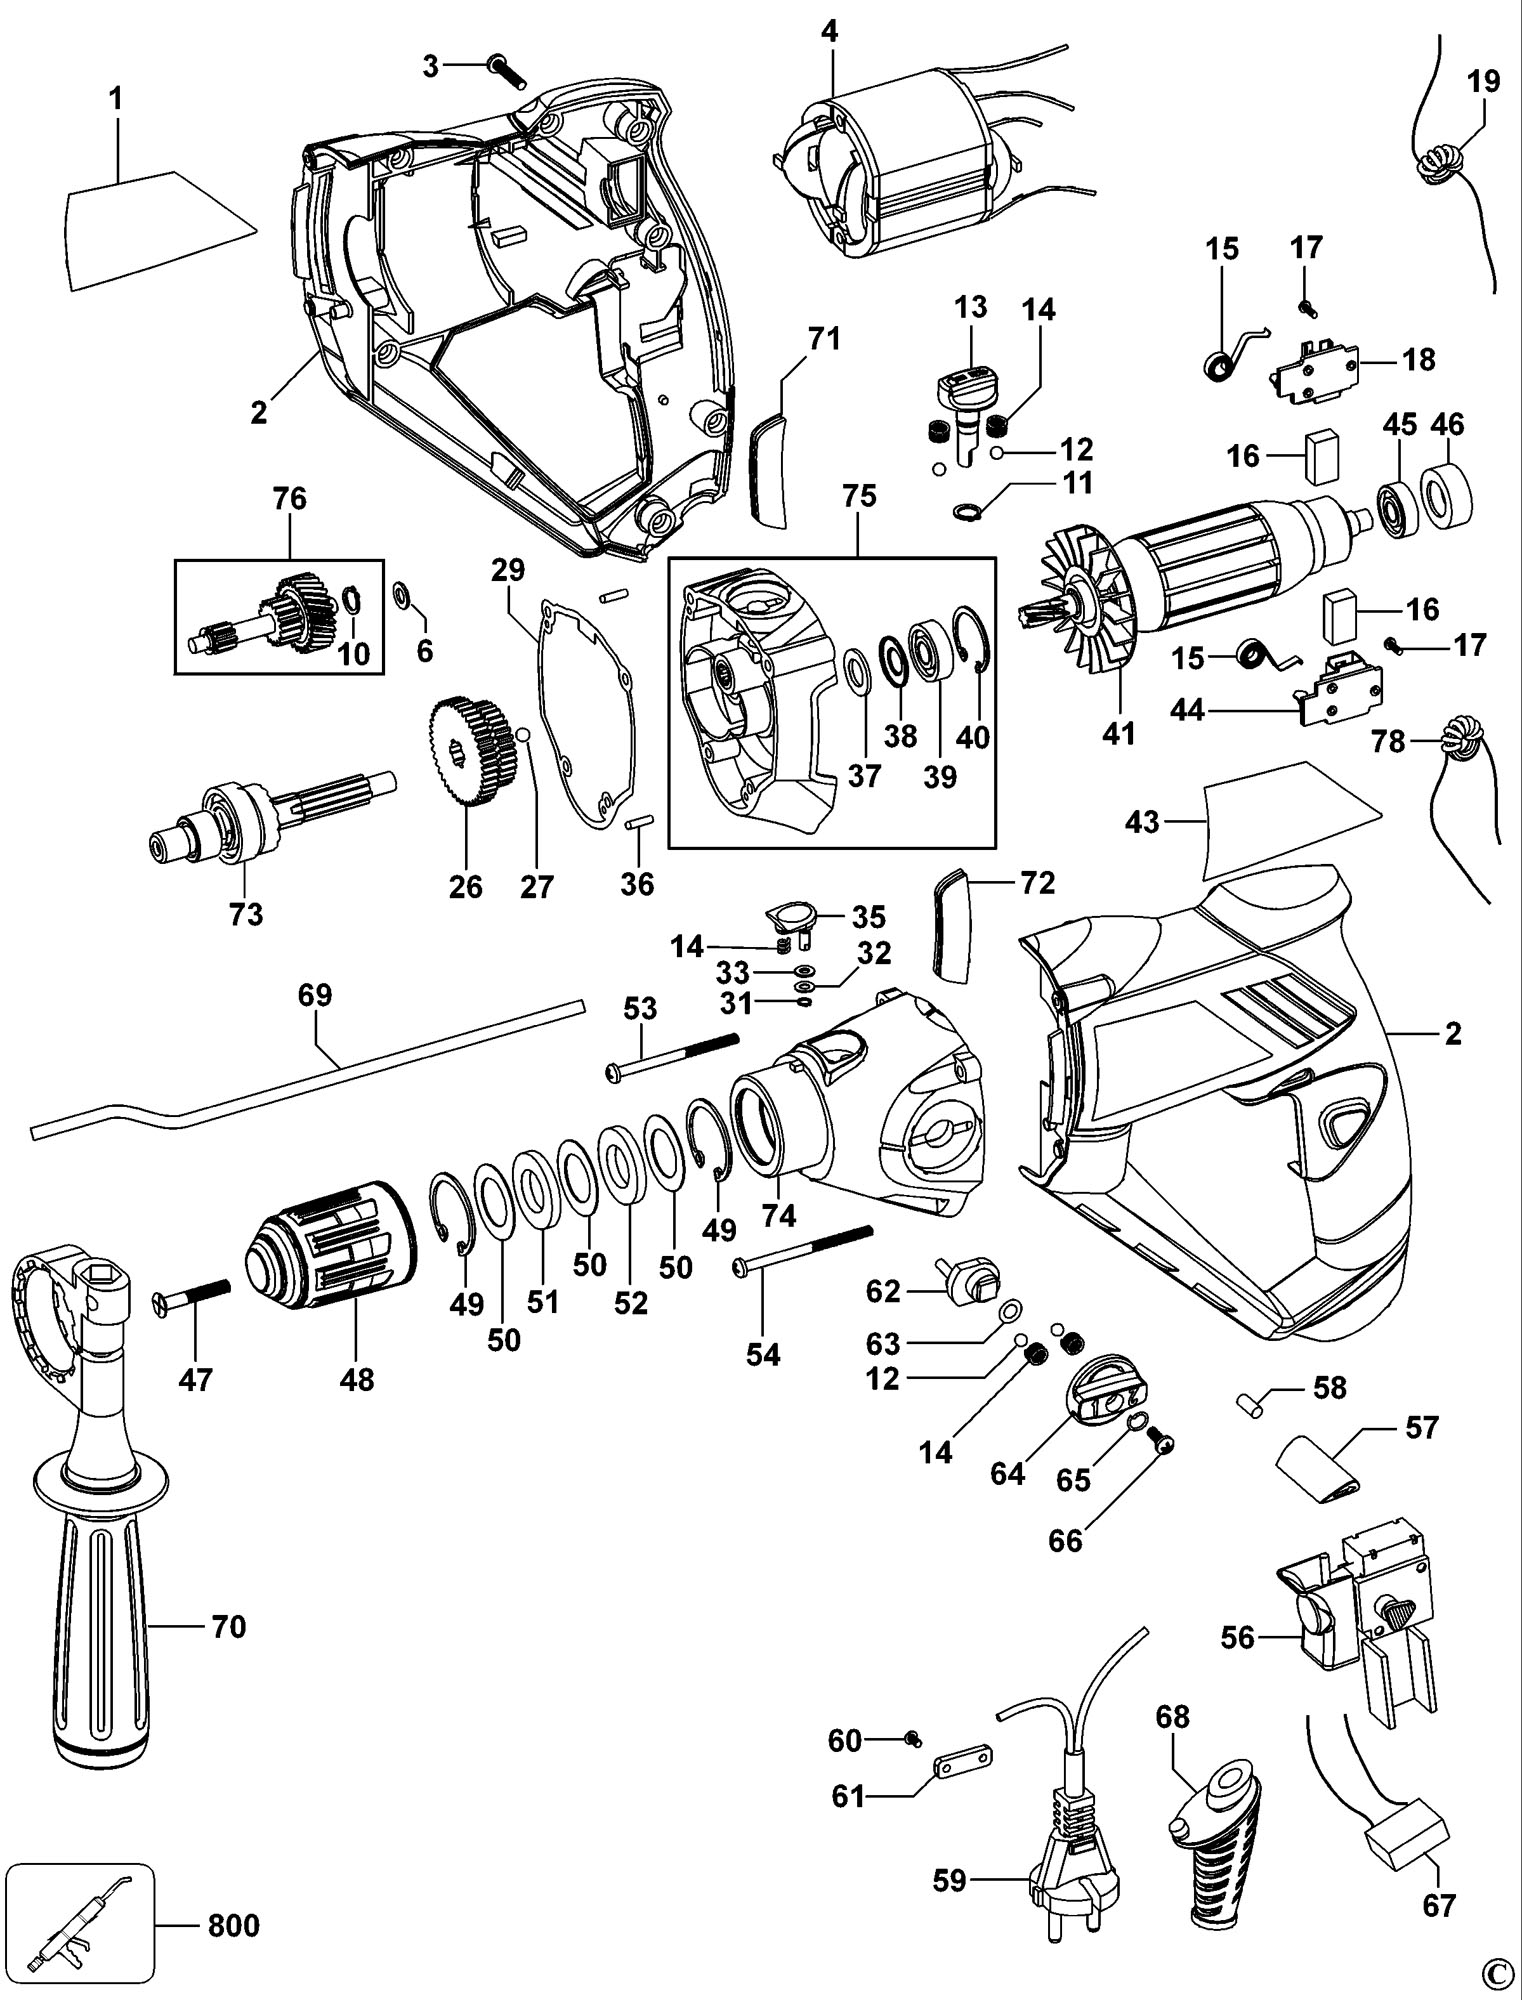 Spares For Black Amp Decker Kr110 Hammer Drill Type 1 2